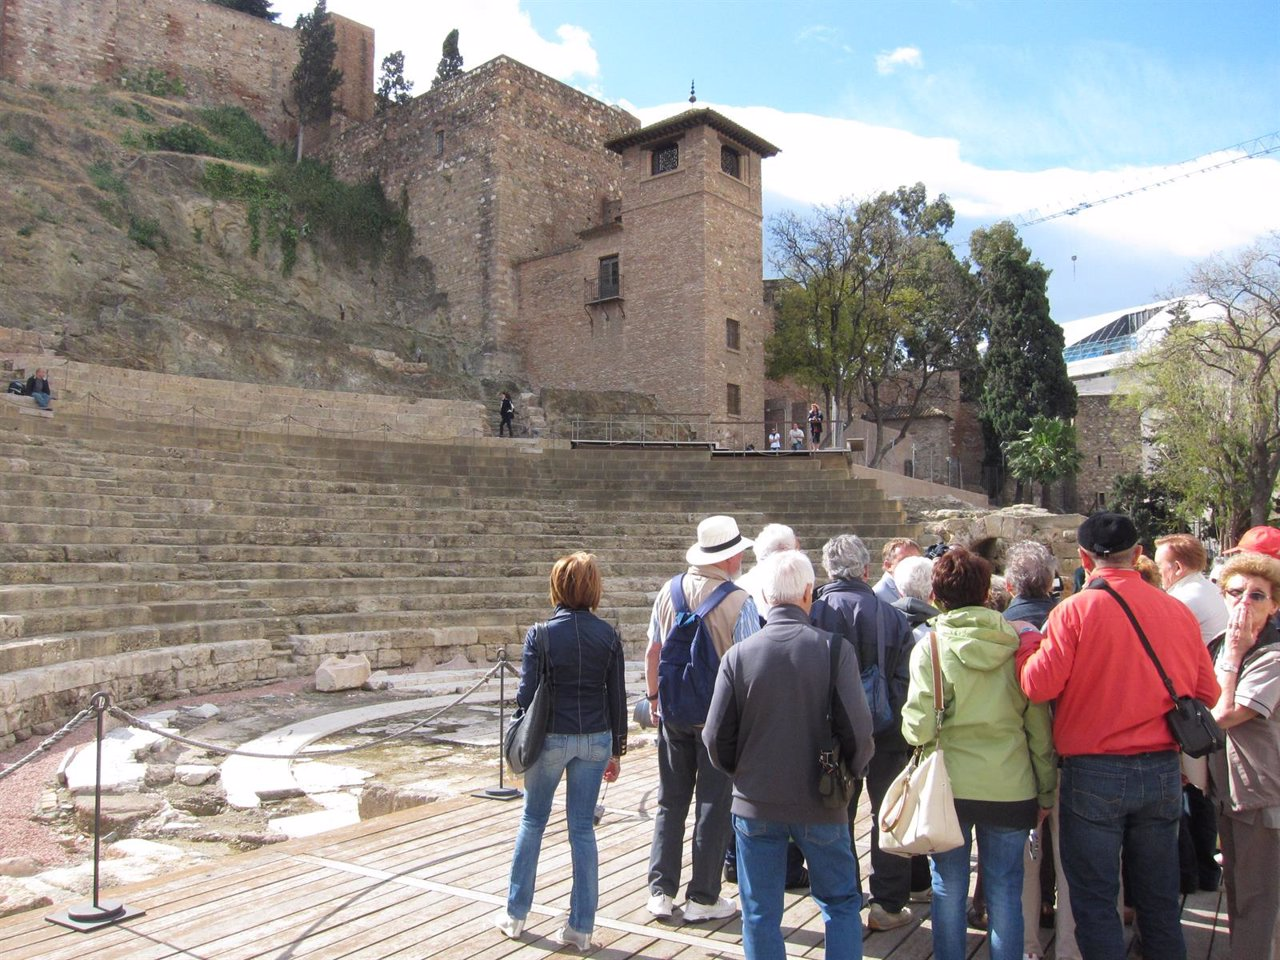 Turistas En El Teatro Romano De Málaga Turismo Urbano Viajeros Extranjeros